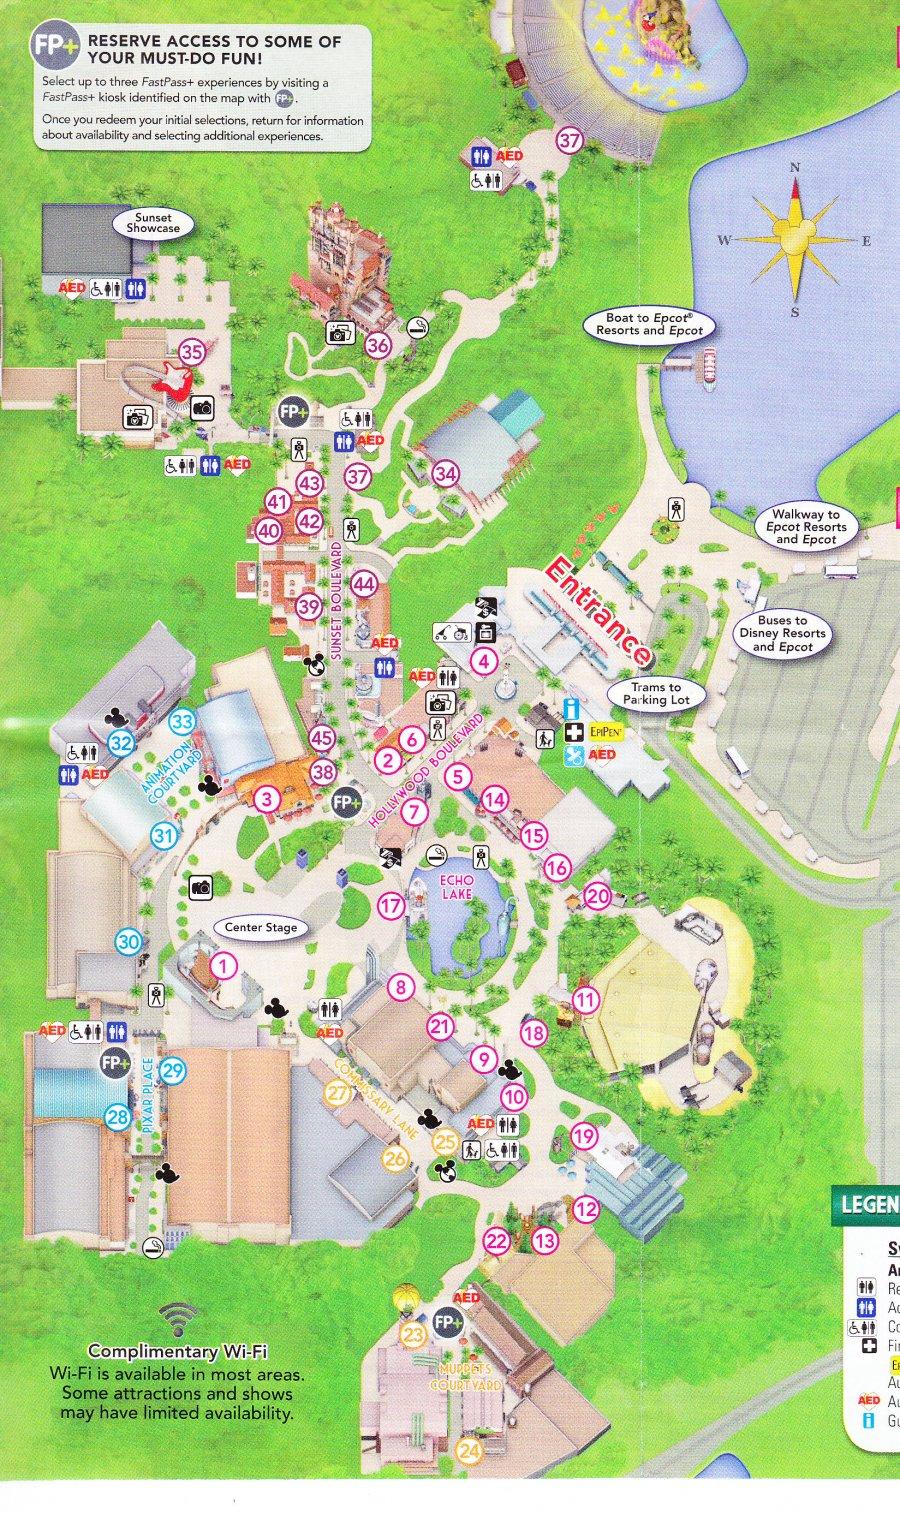 Disney 39 s Hollywood Studios at Walt Disney World 2016 Park Map